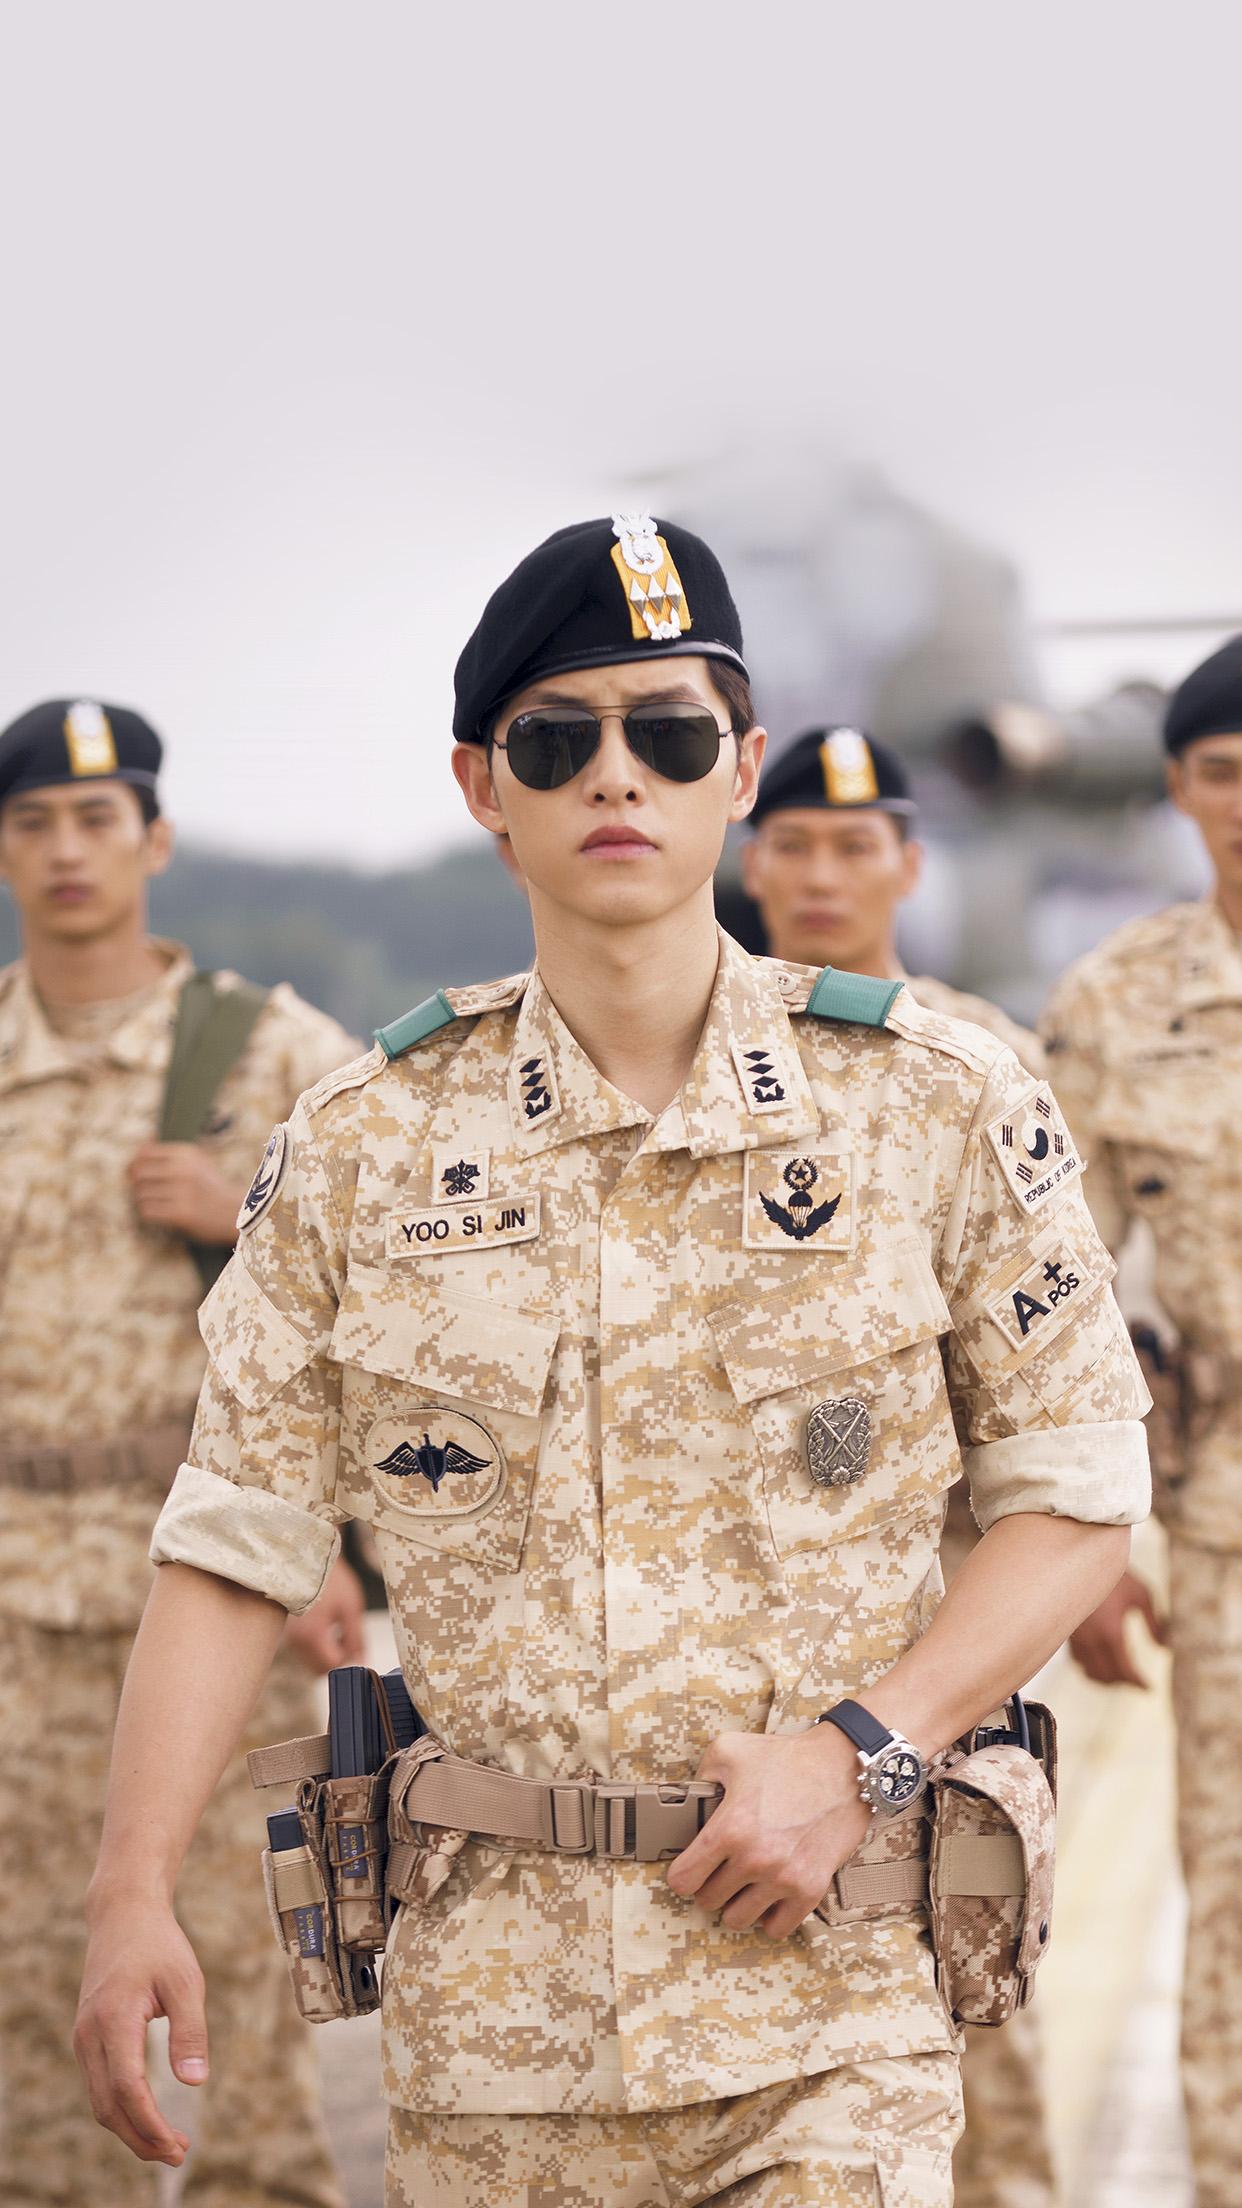 hi08-descendants-of-the-sun-heygyo-joonggi-military-wallpaper